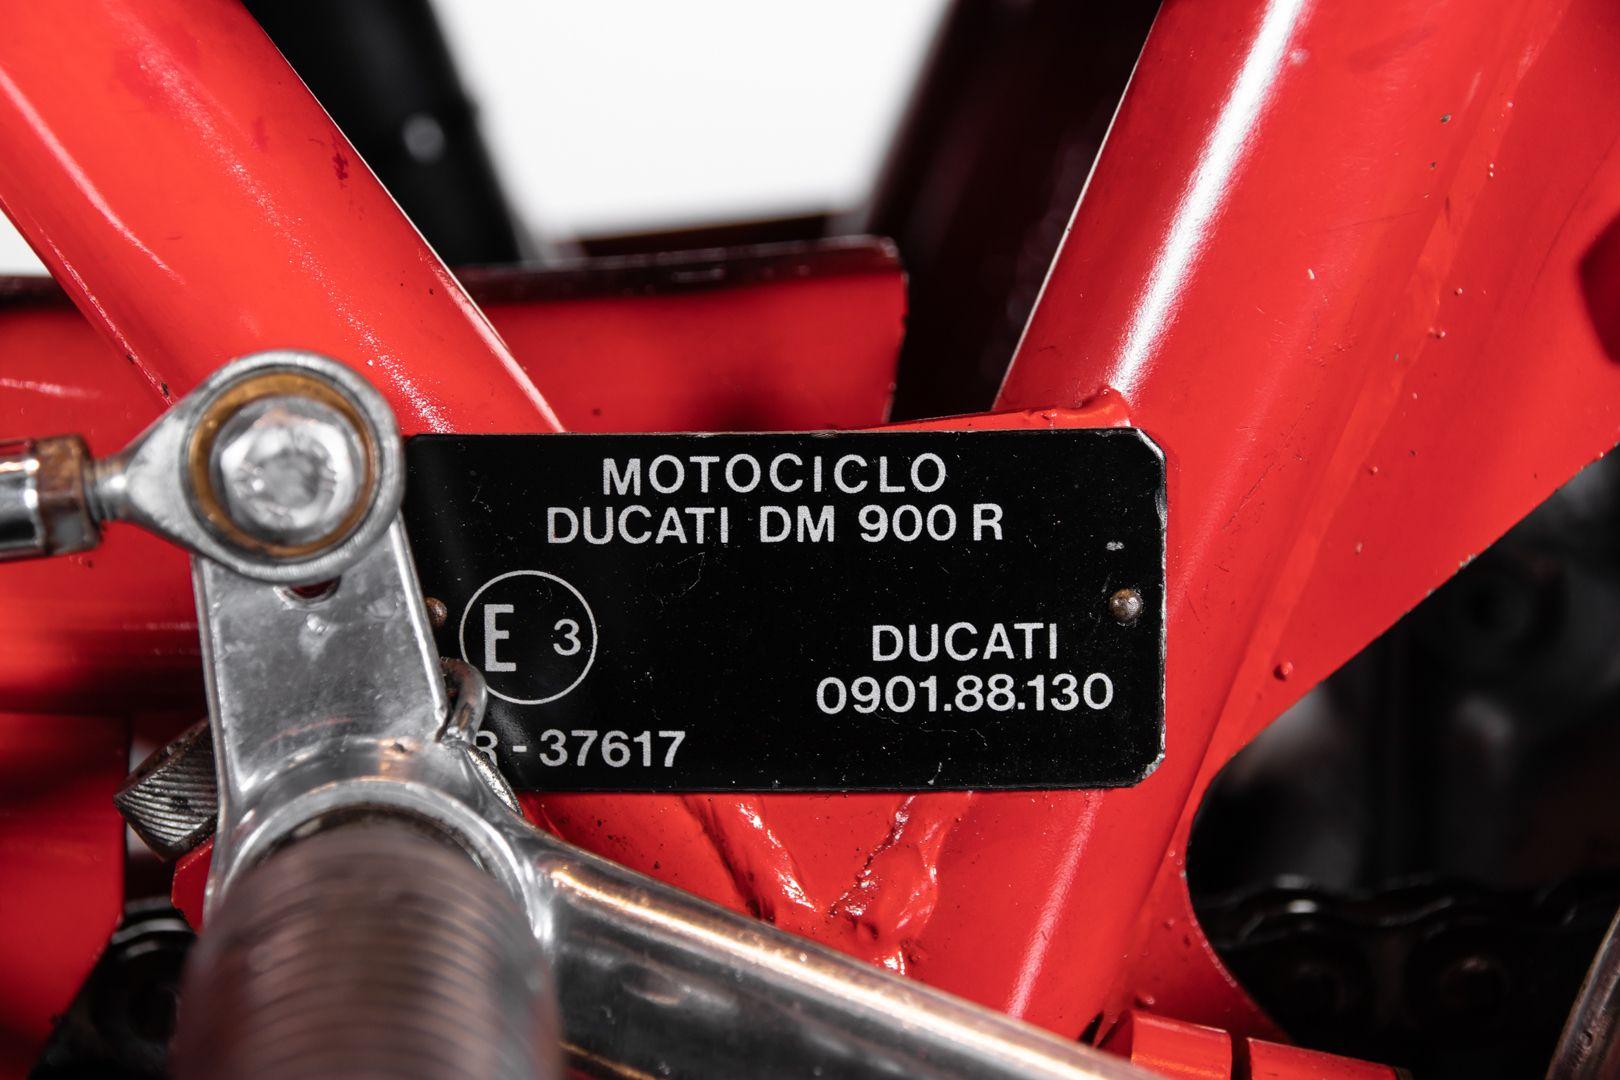 1983 Ducati 900 Mike Hailwood Replica 71435